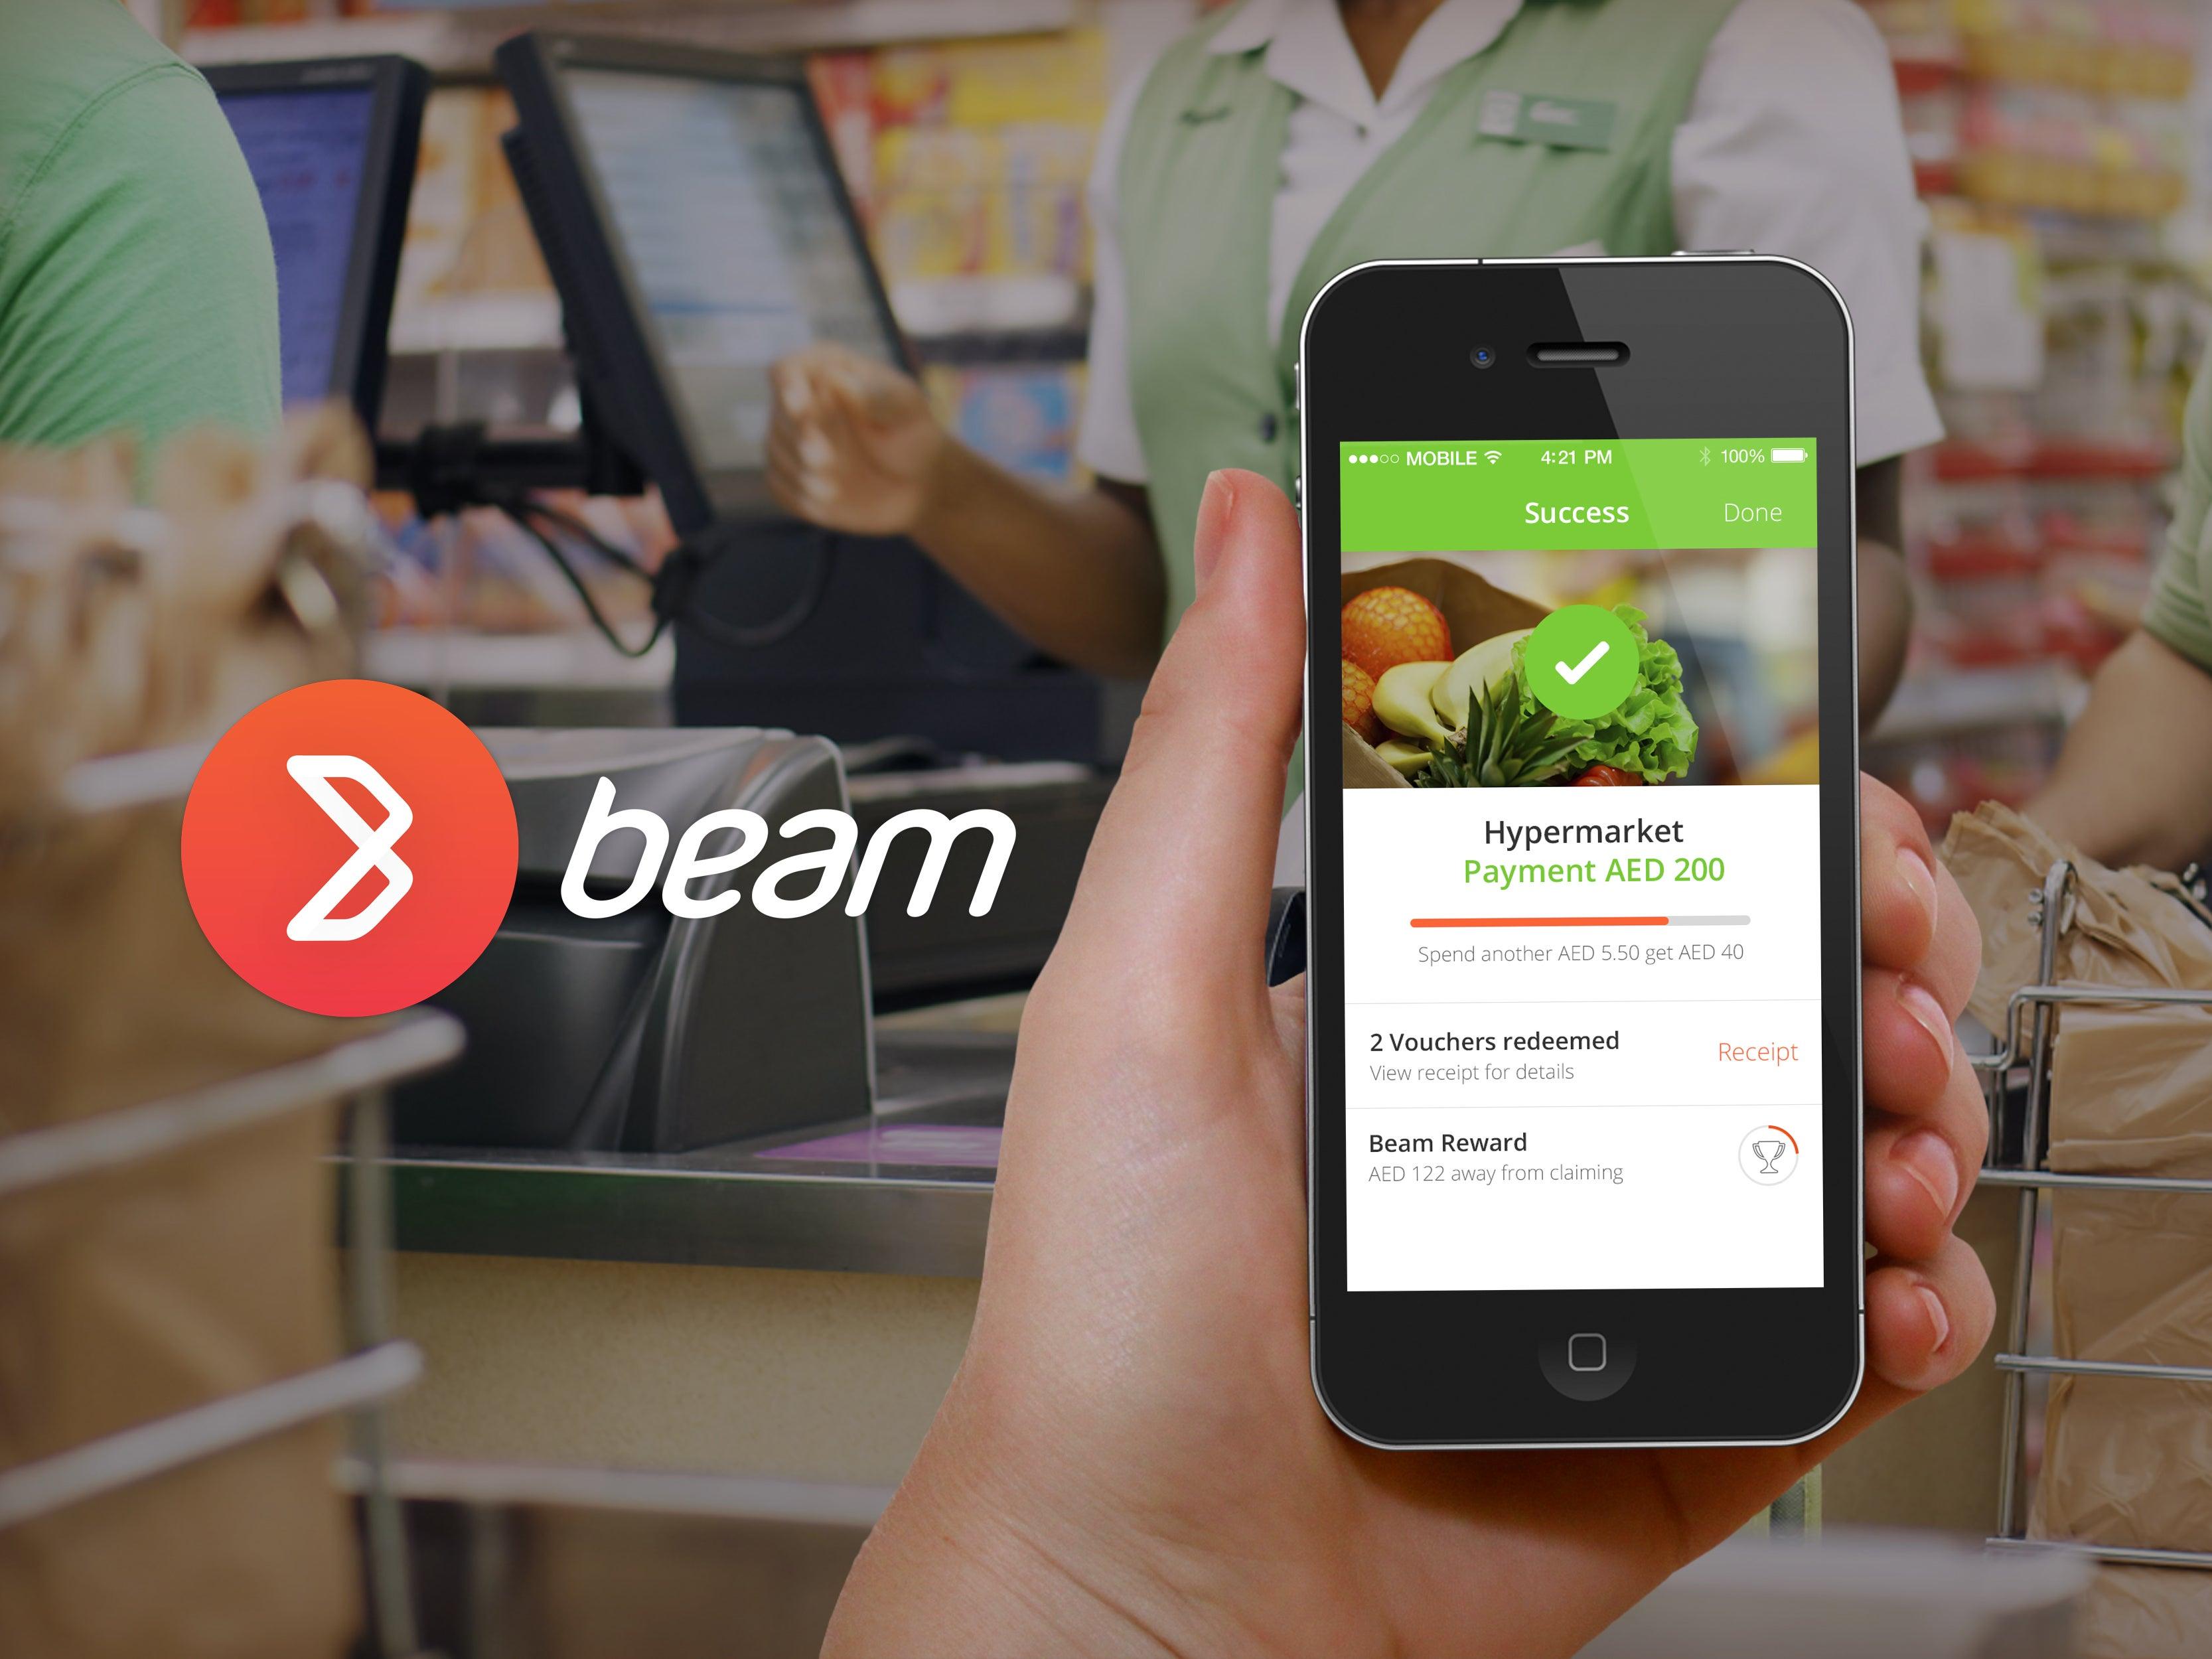 e38c25543d76 Beam Wallet Making Ping More Rewarding. Beam Franchise Login. Beam Smiles.  Jeremy Clouse Beam Smiles. Share This. Reebok X Beam Franchise Steve Francis  ...